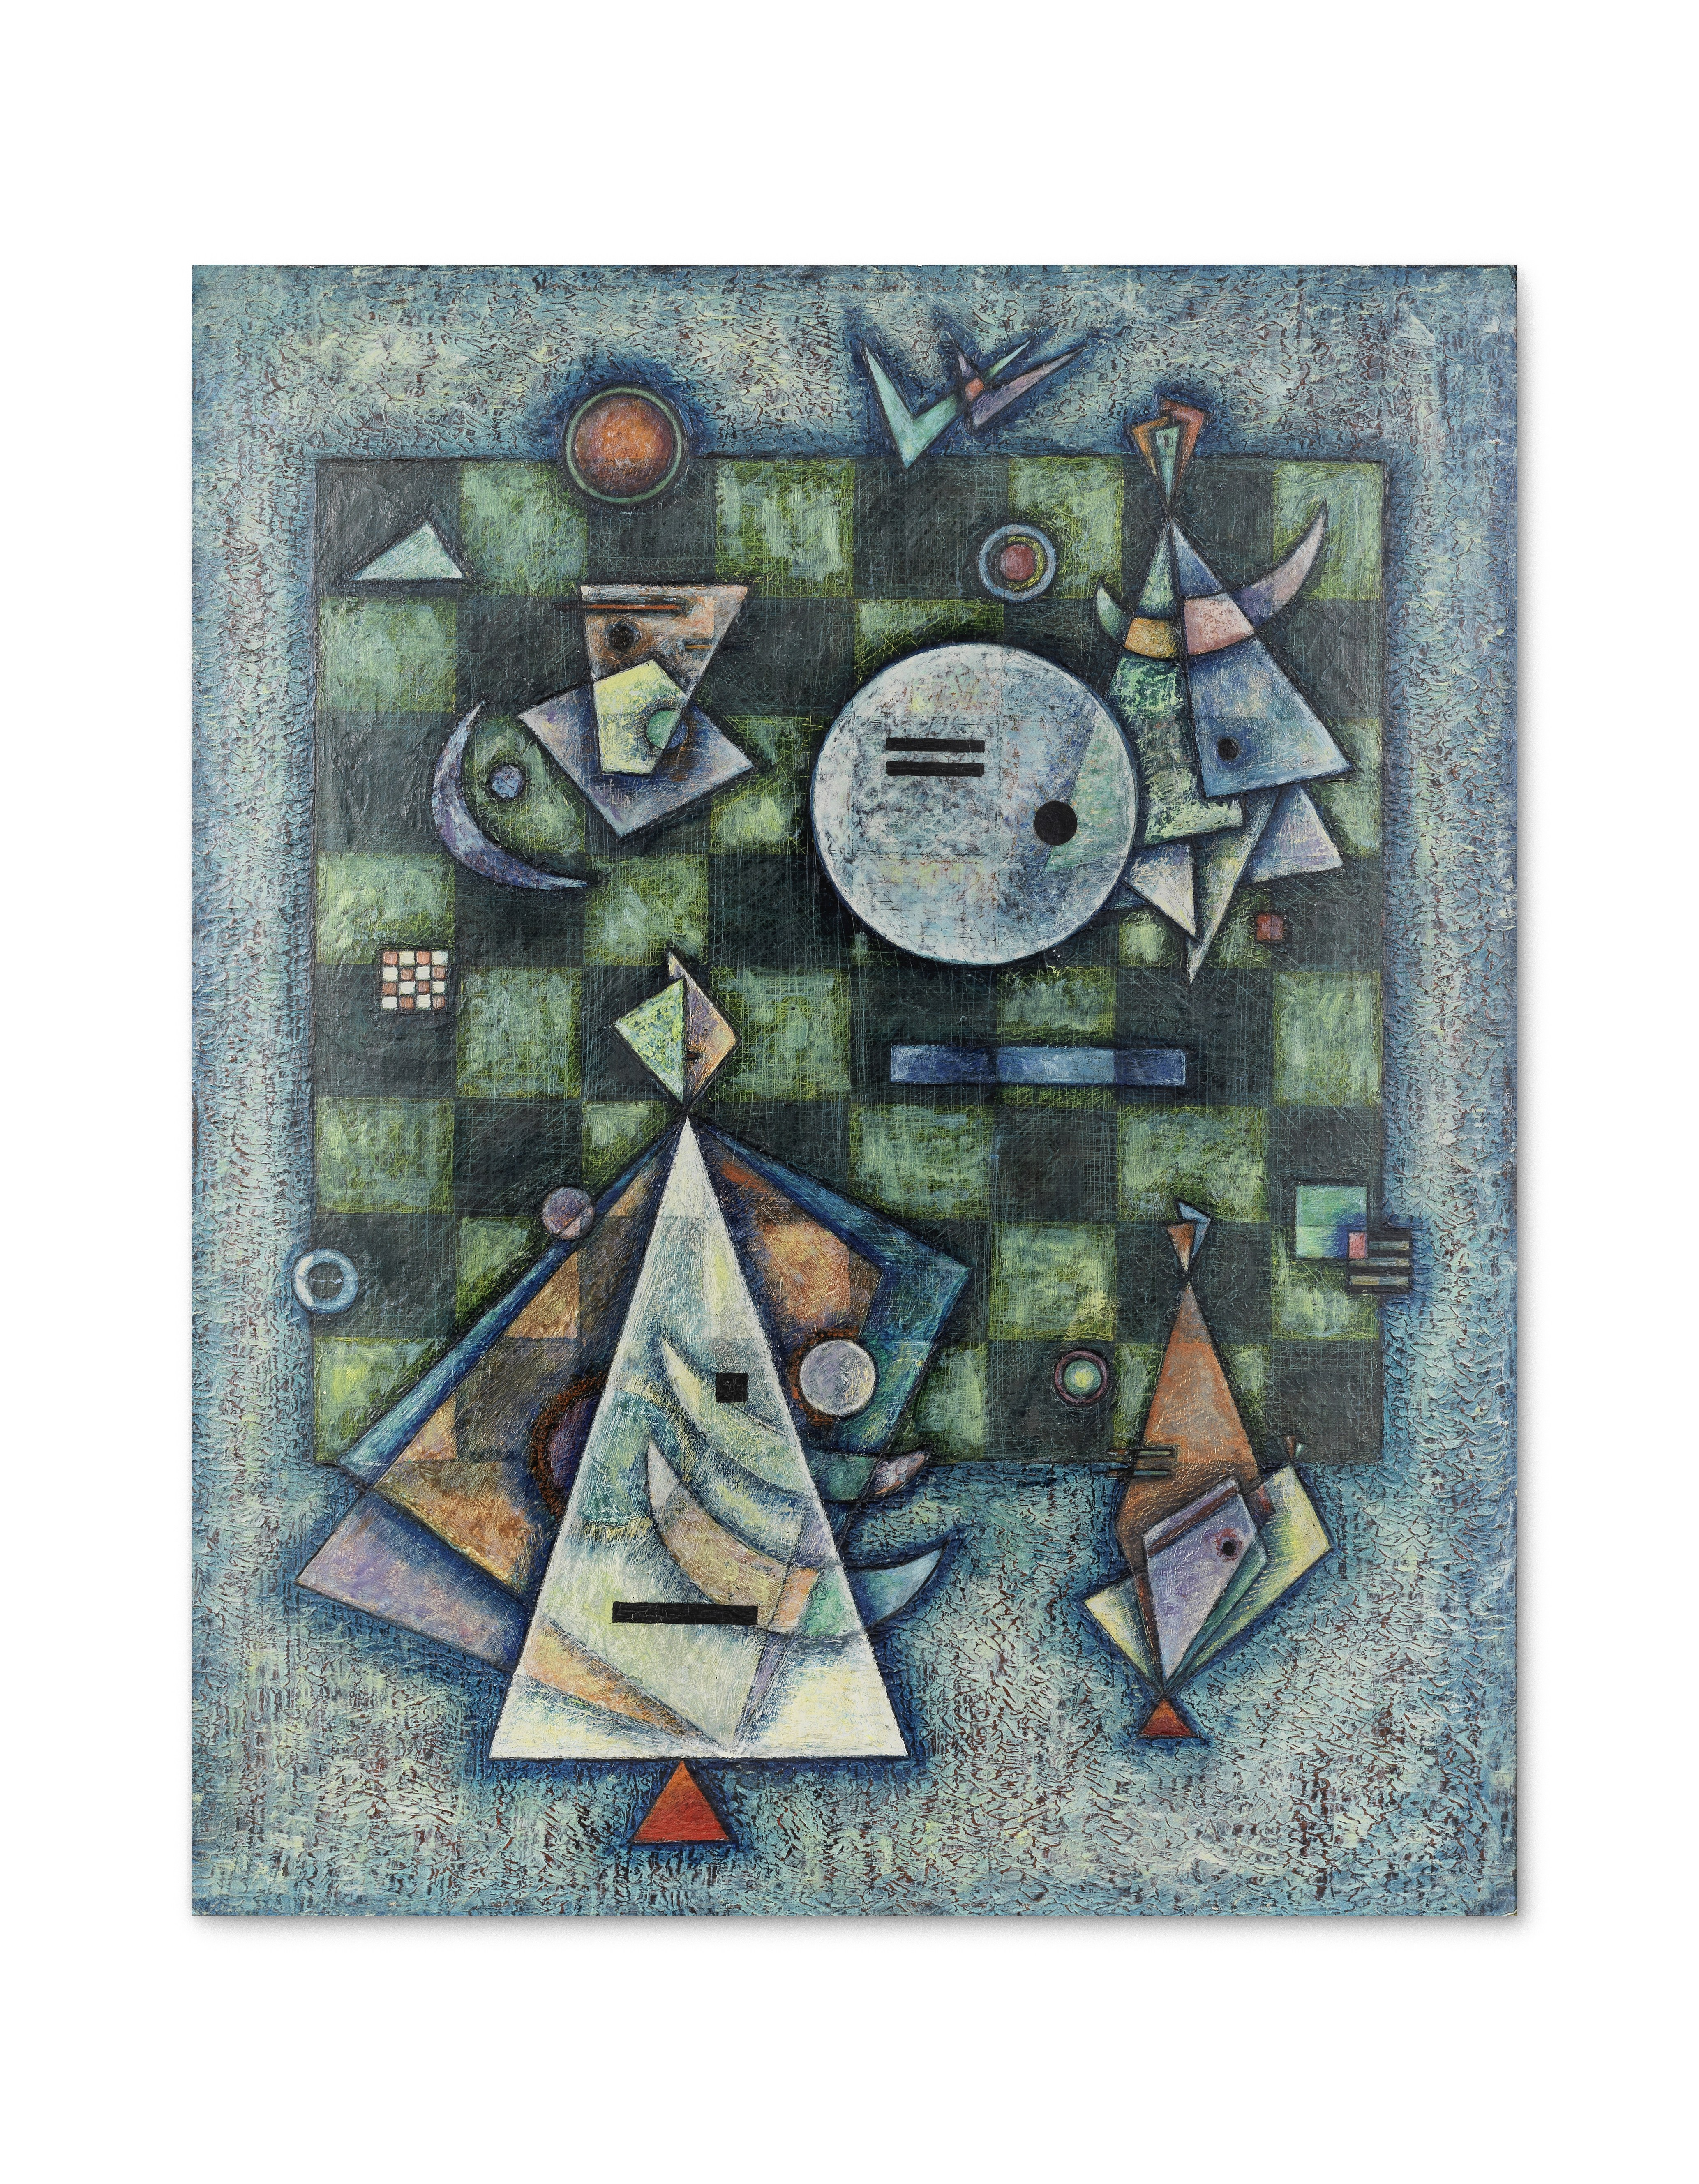 Lot 8 - Hannes Beckmann (1909-1977) Ensemble, 1946